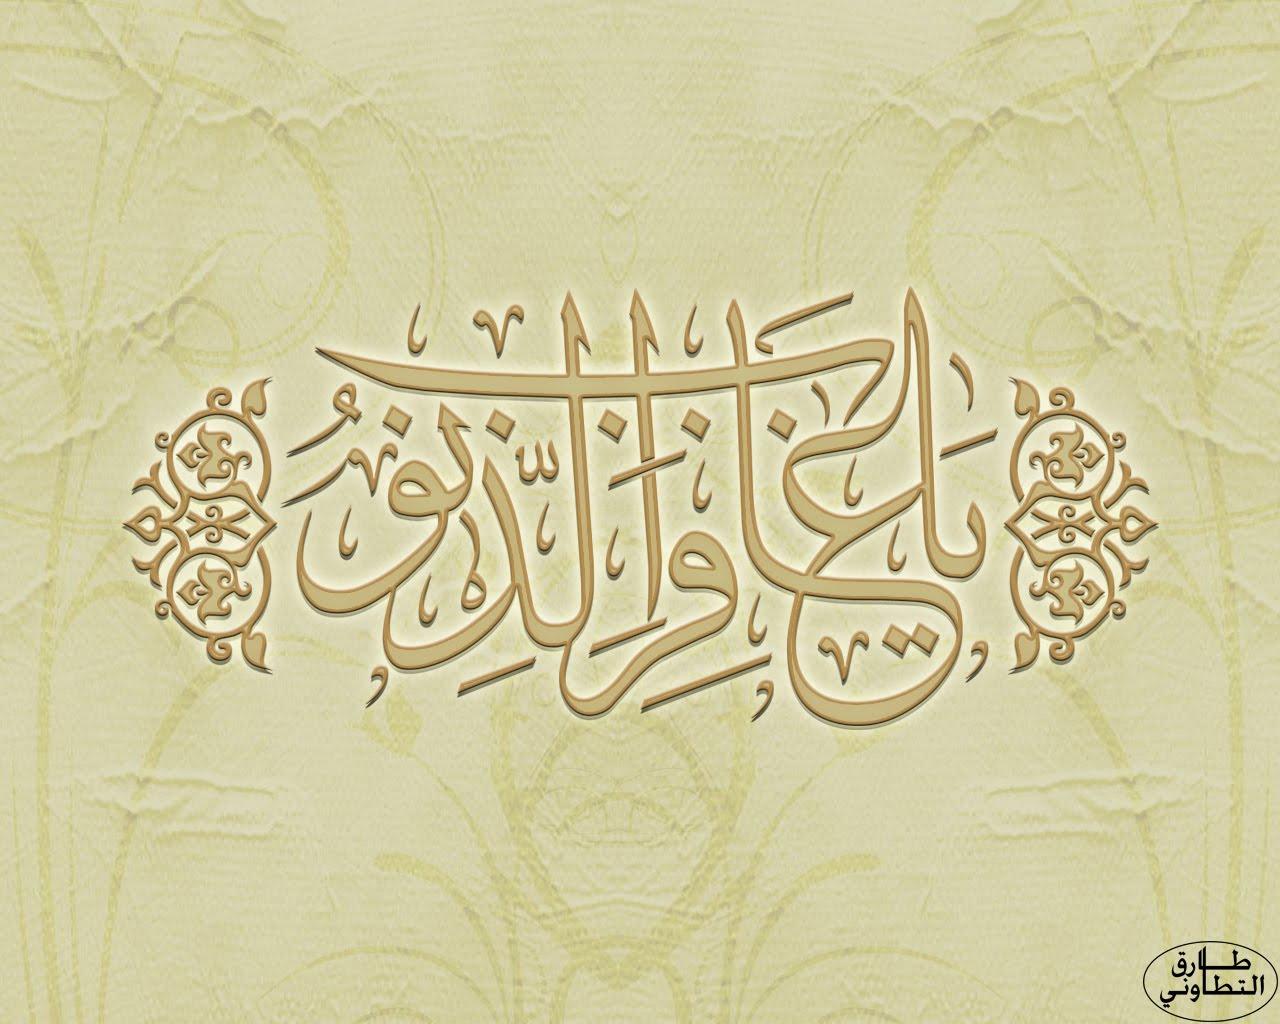 http://1.bp.blogspot.com/_e_iT6XvE4tk/S9aeJdVTY2I/AAAAAAAAAaY/9Dhl2i0Z81I/s1600/Islam%28270%29.jpg